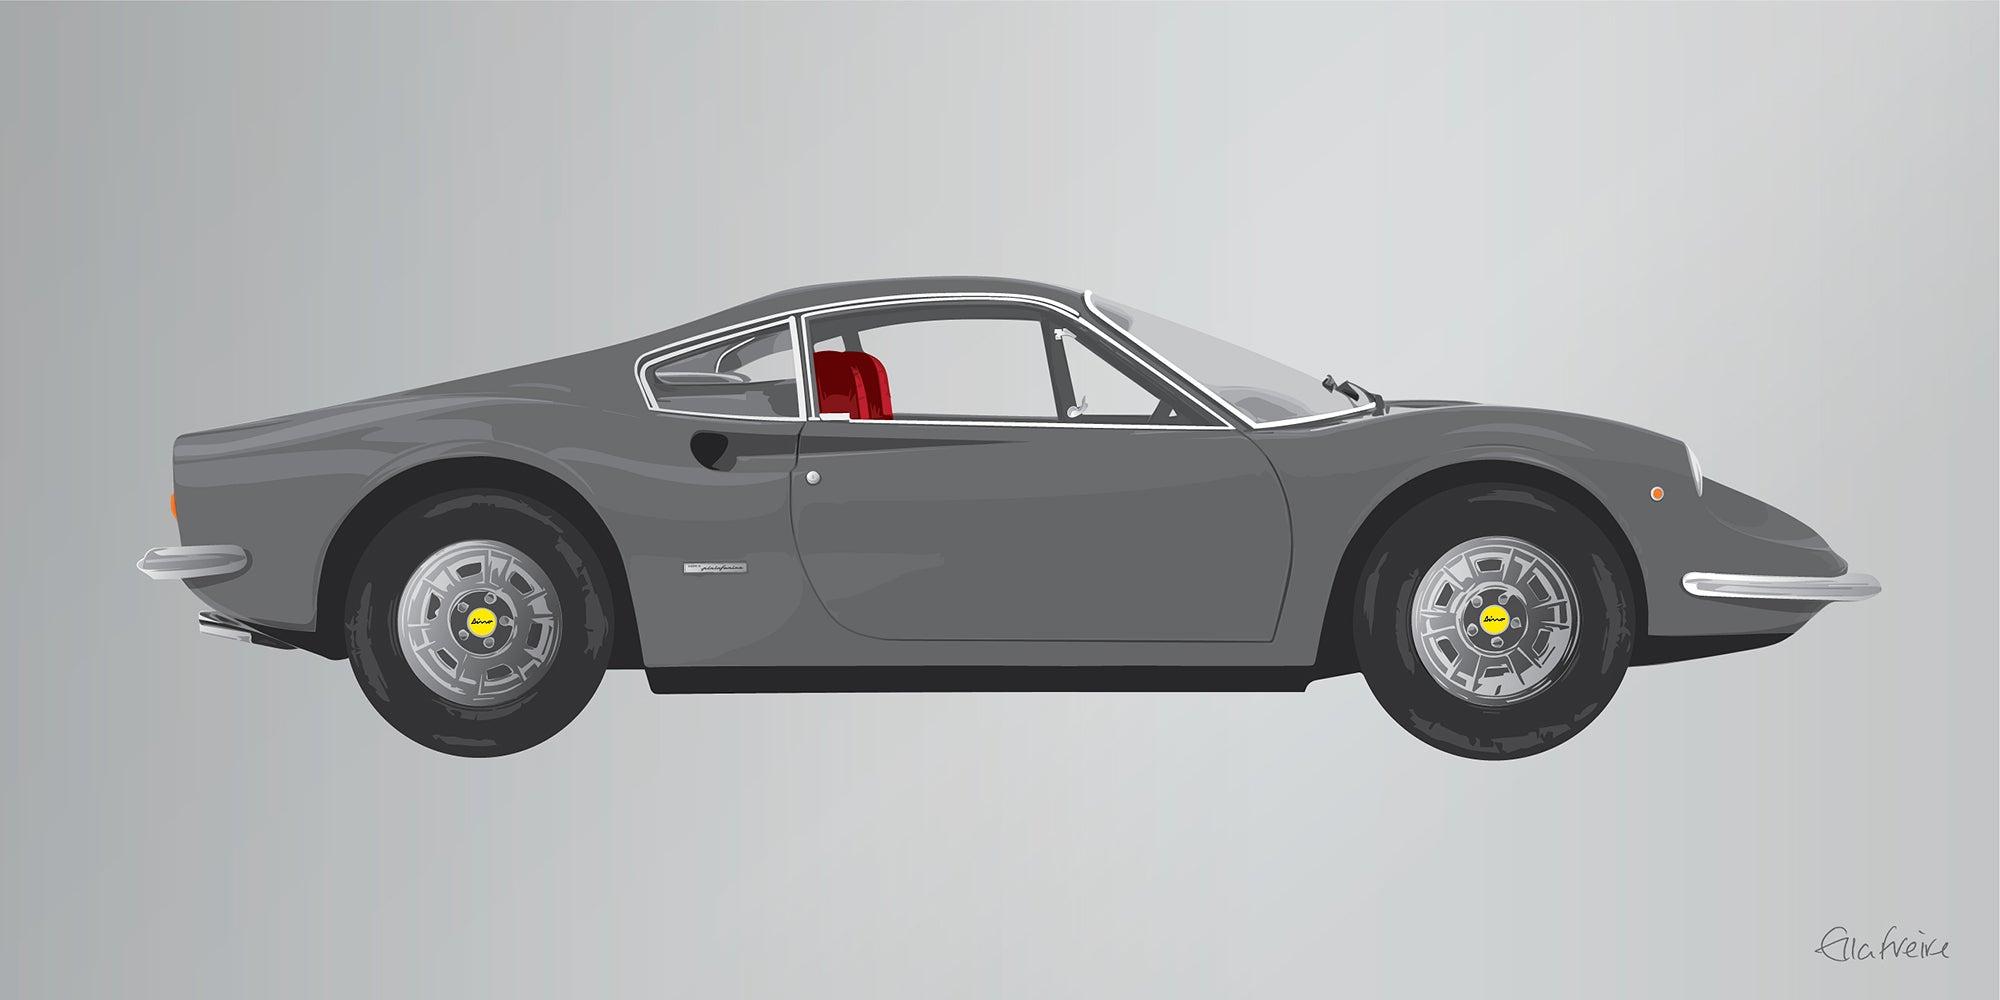 Ella Freire Ferrari Dino Grey Contemporary Grey Ferrari Car Screenprint Mixed Media For Sale At 1stdibs